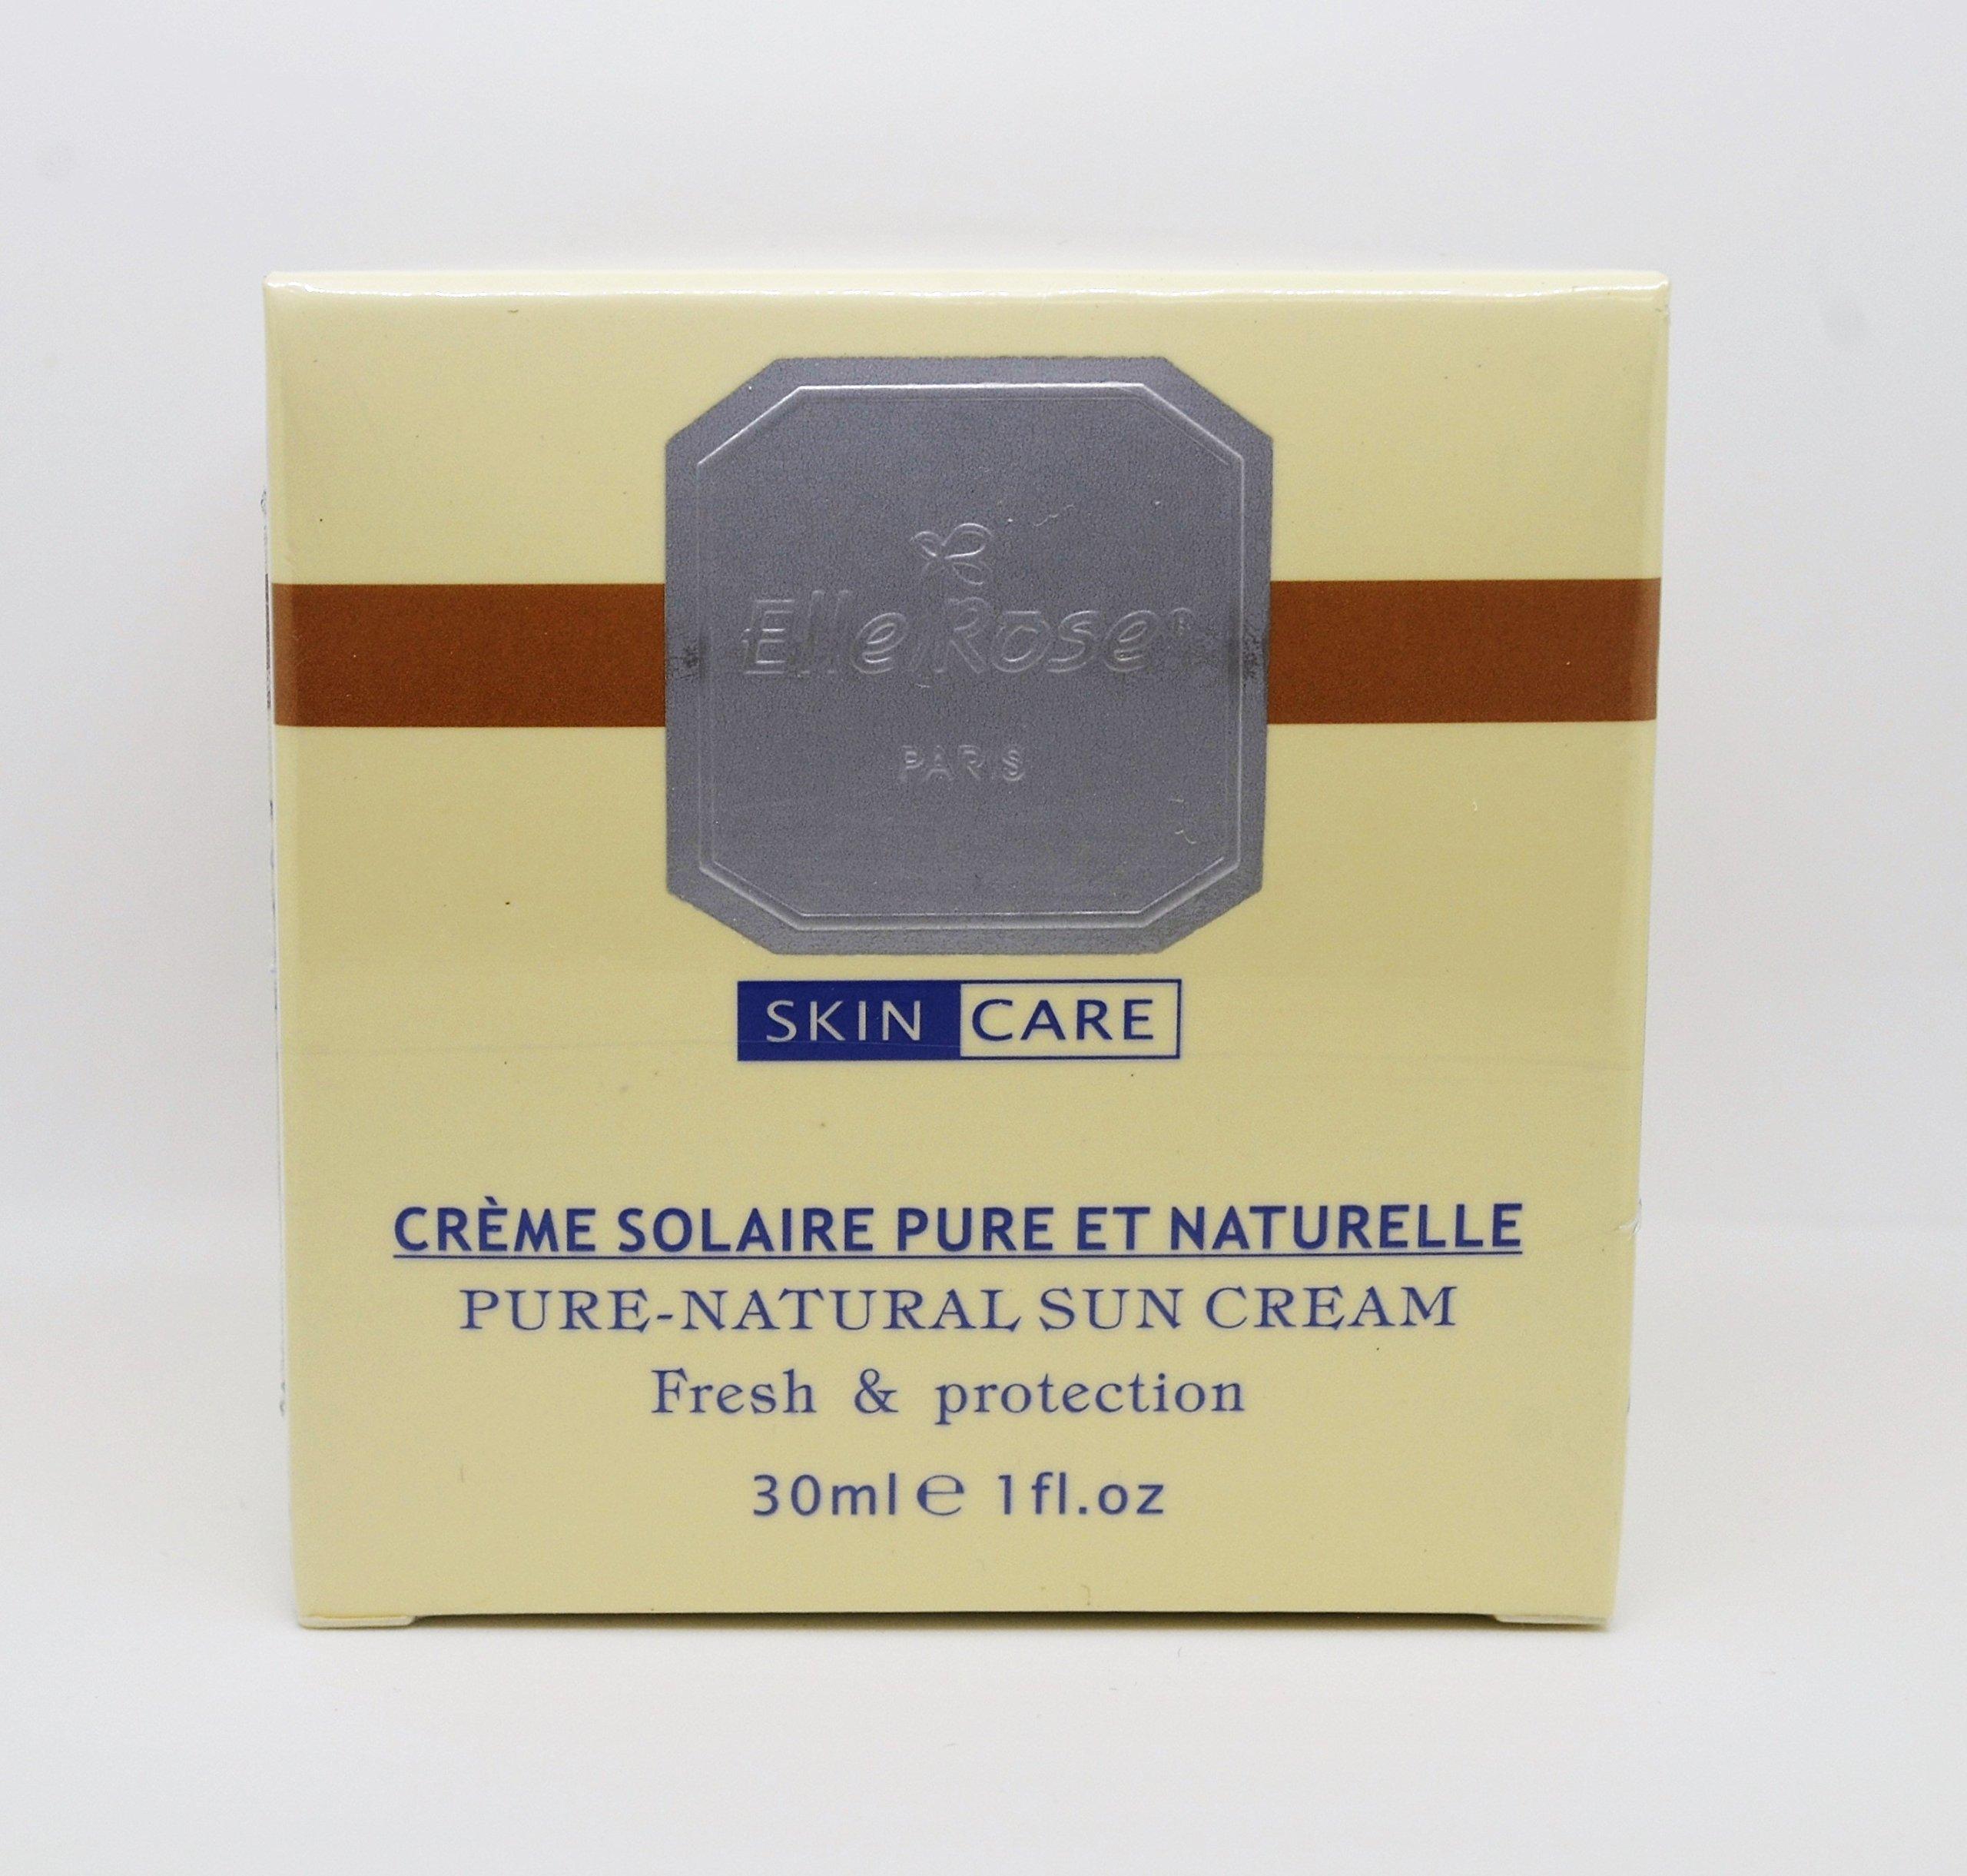 Alitenice Elle Rose Pure Natural Sun Cream Sunscreen 30ml by Alitenice Elle Rose